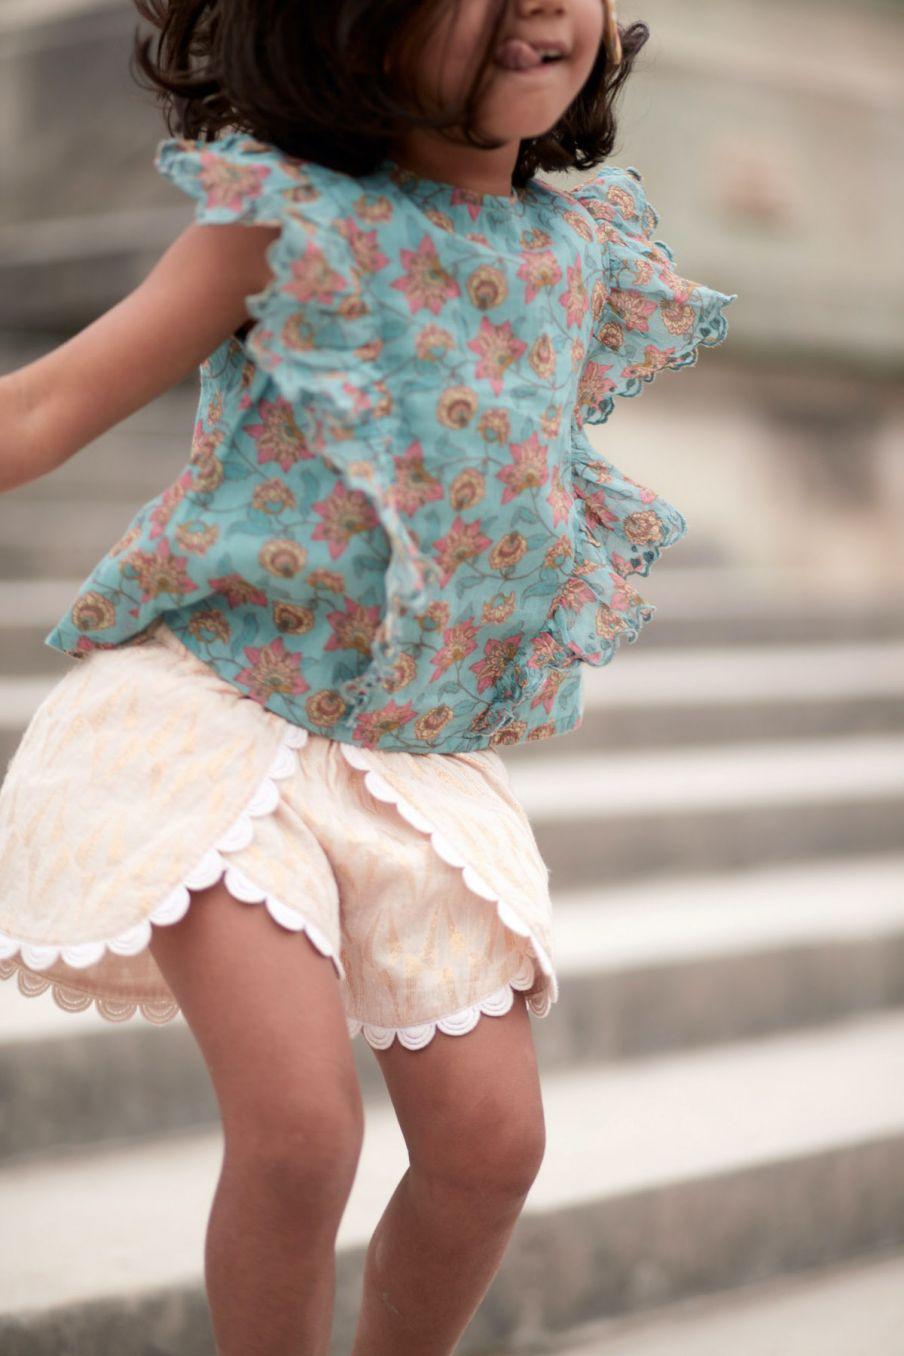 boheme chic vintage blouse fille hija turquoise flowers